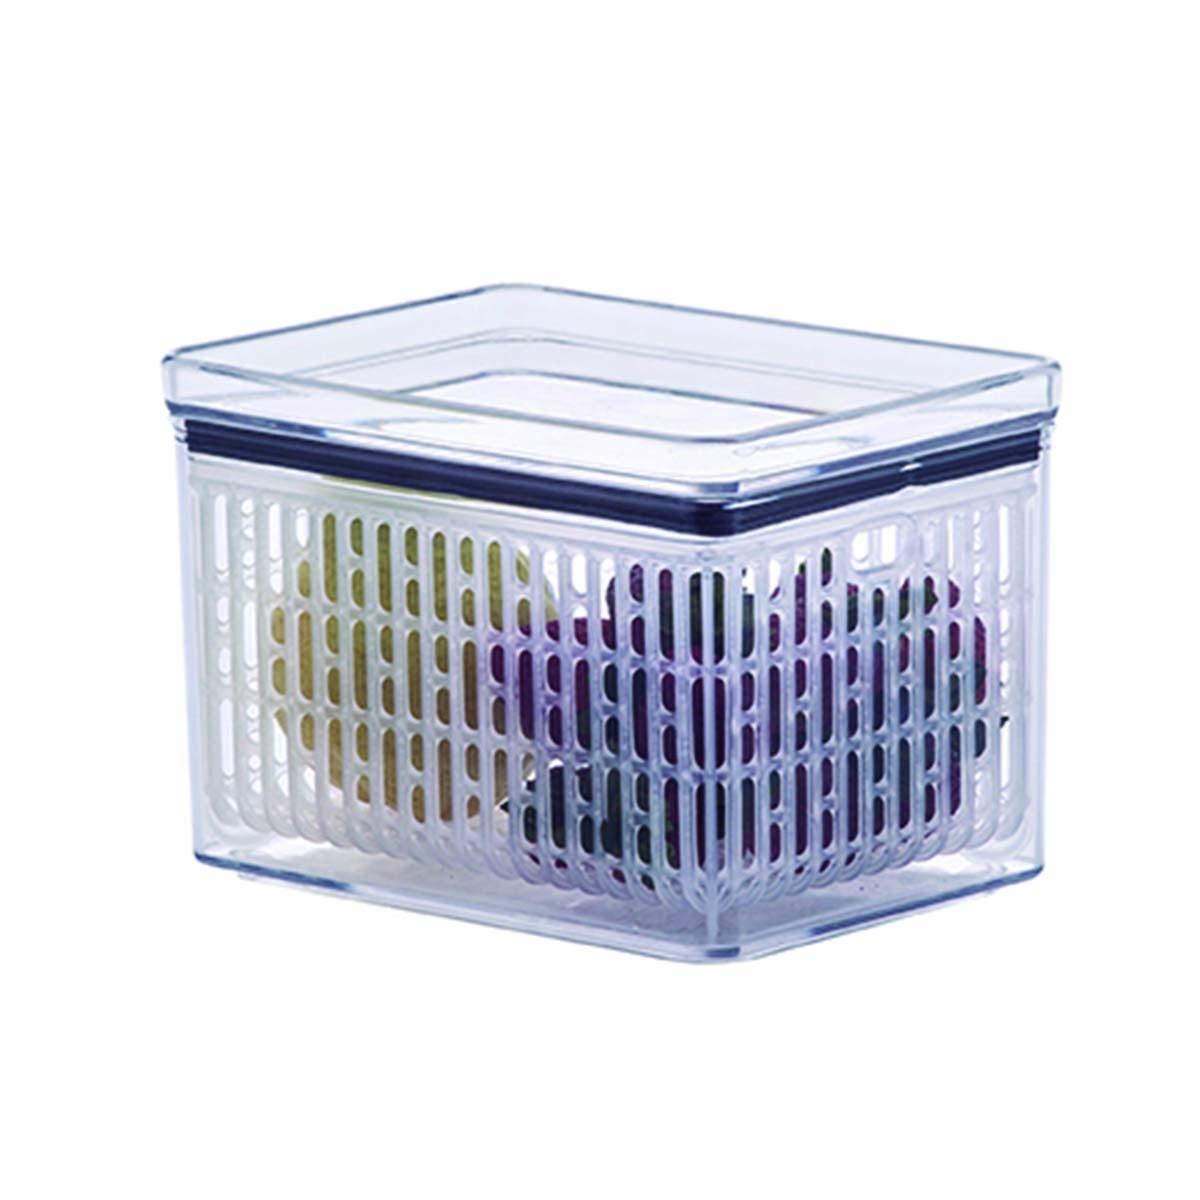 Porta-Tudo Paramount Plásticos Fresh Hermético Lumini 1.800 Ml